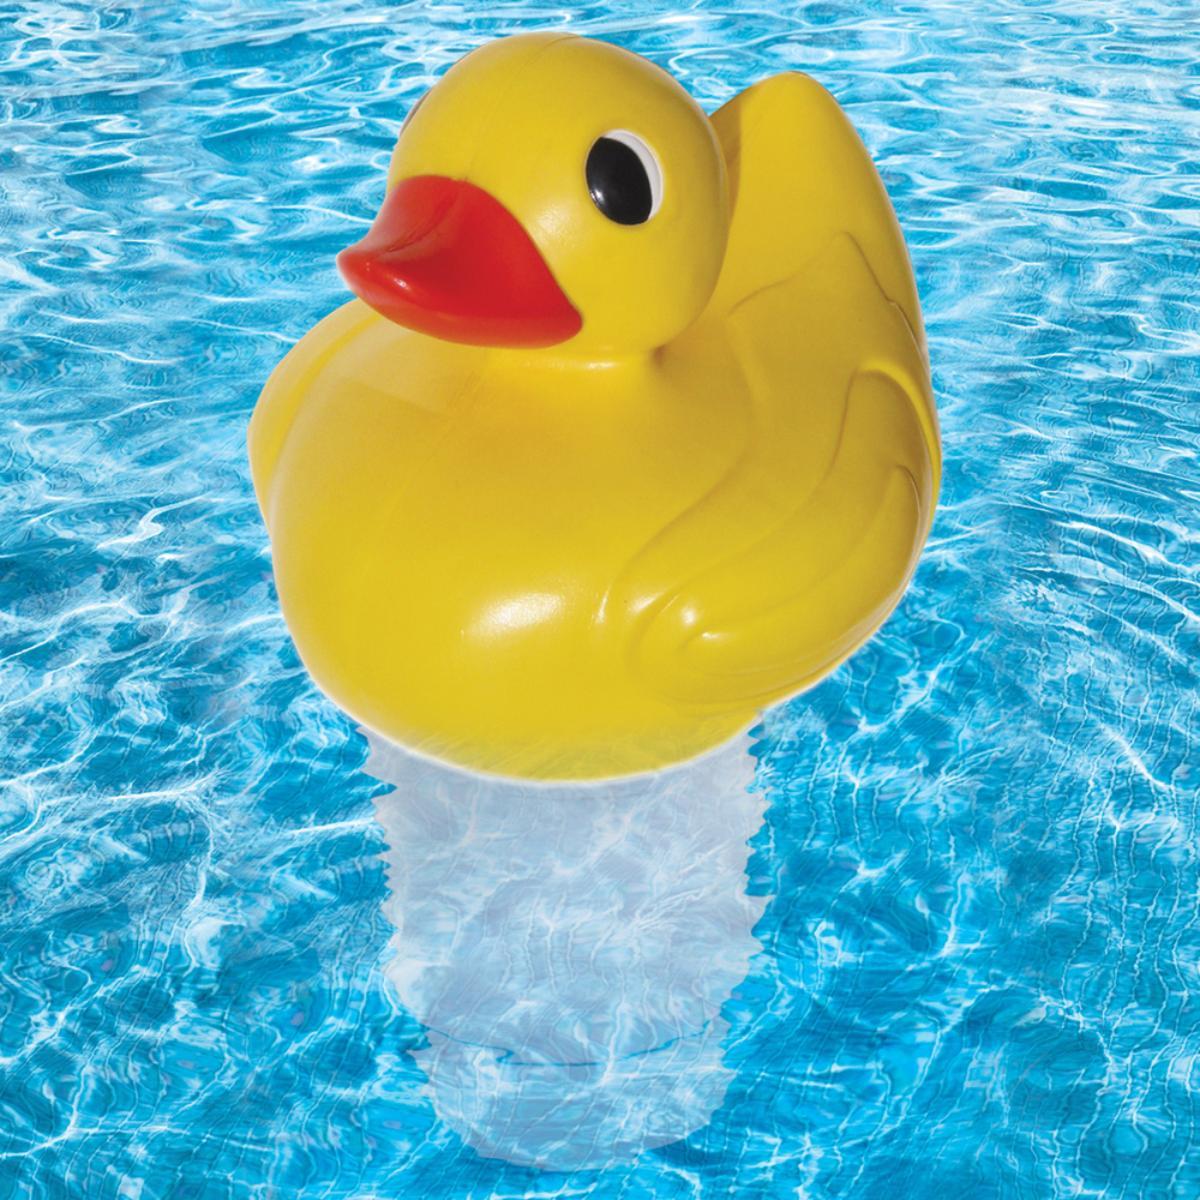 Pool duck chlorine dispenser pool accessories splash - Duck repellent for swimming pools ...